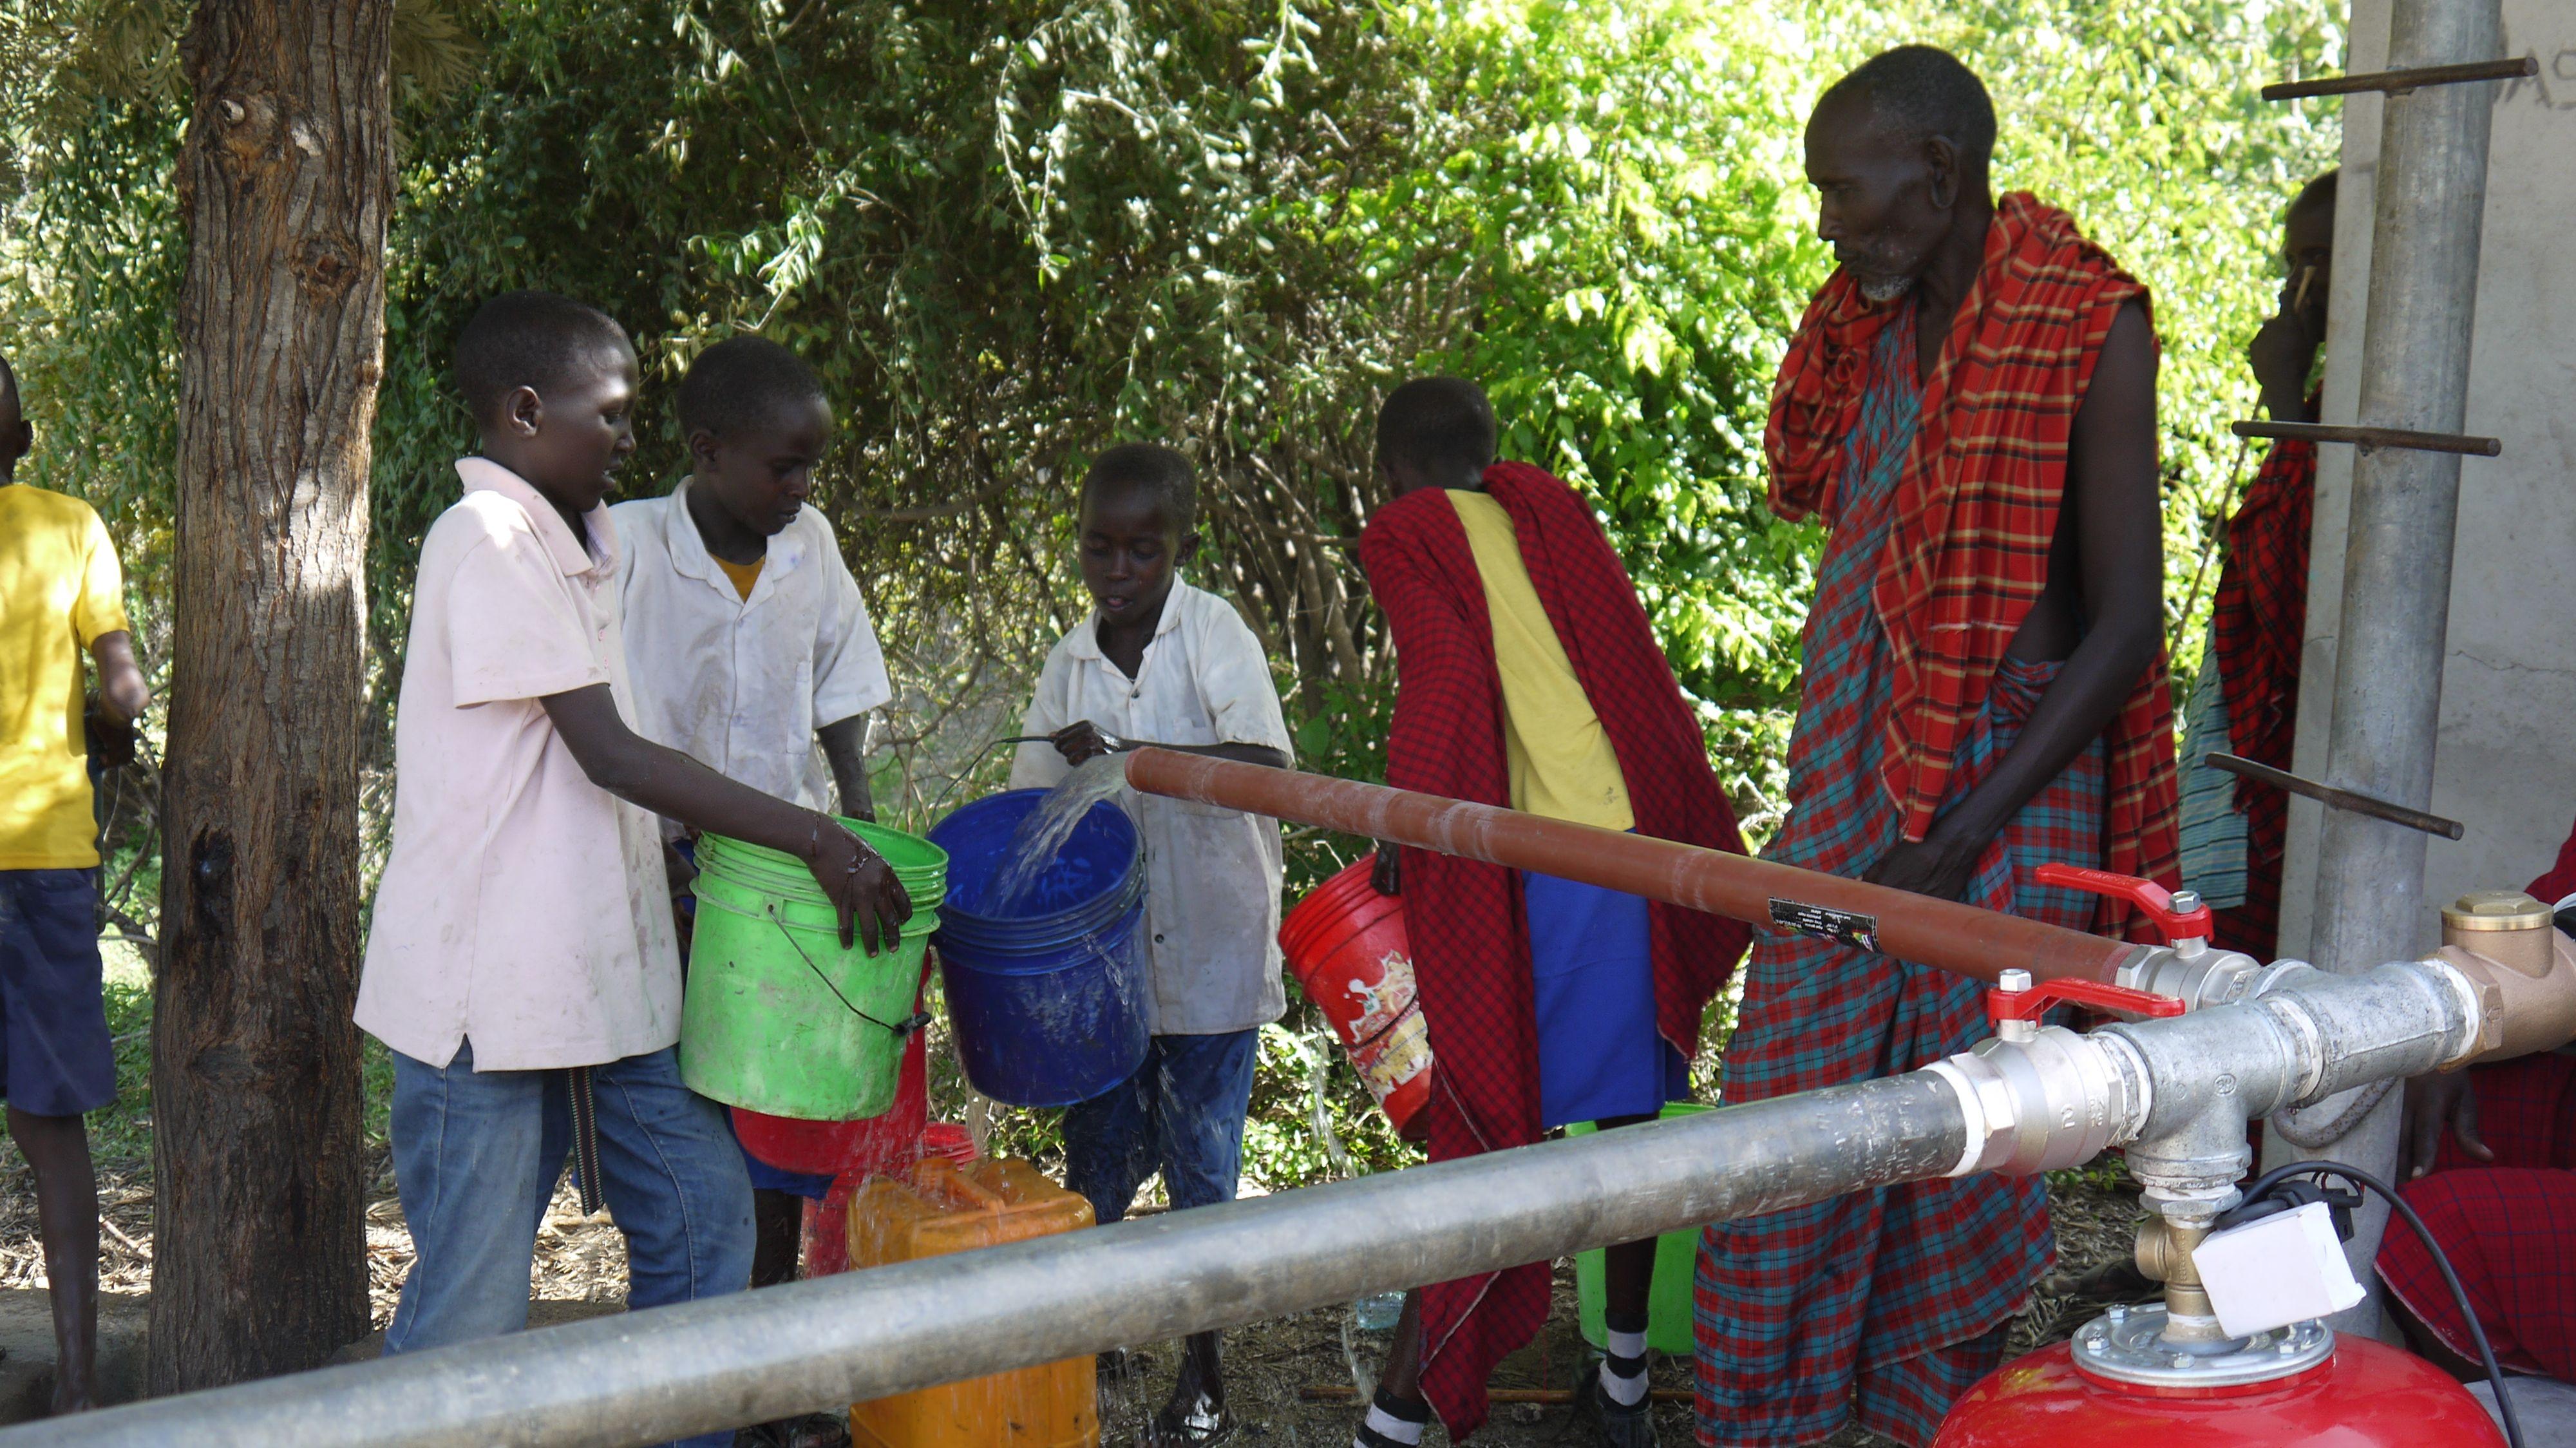 Ndedo Village Maasai Steppe | Tanzania<br/>